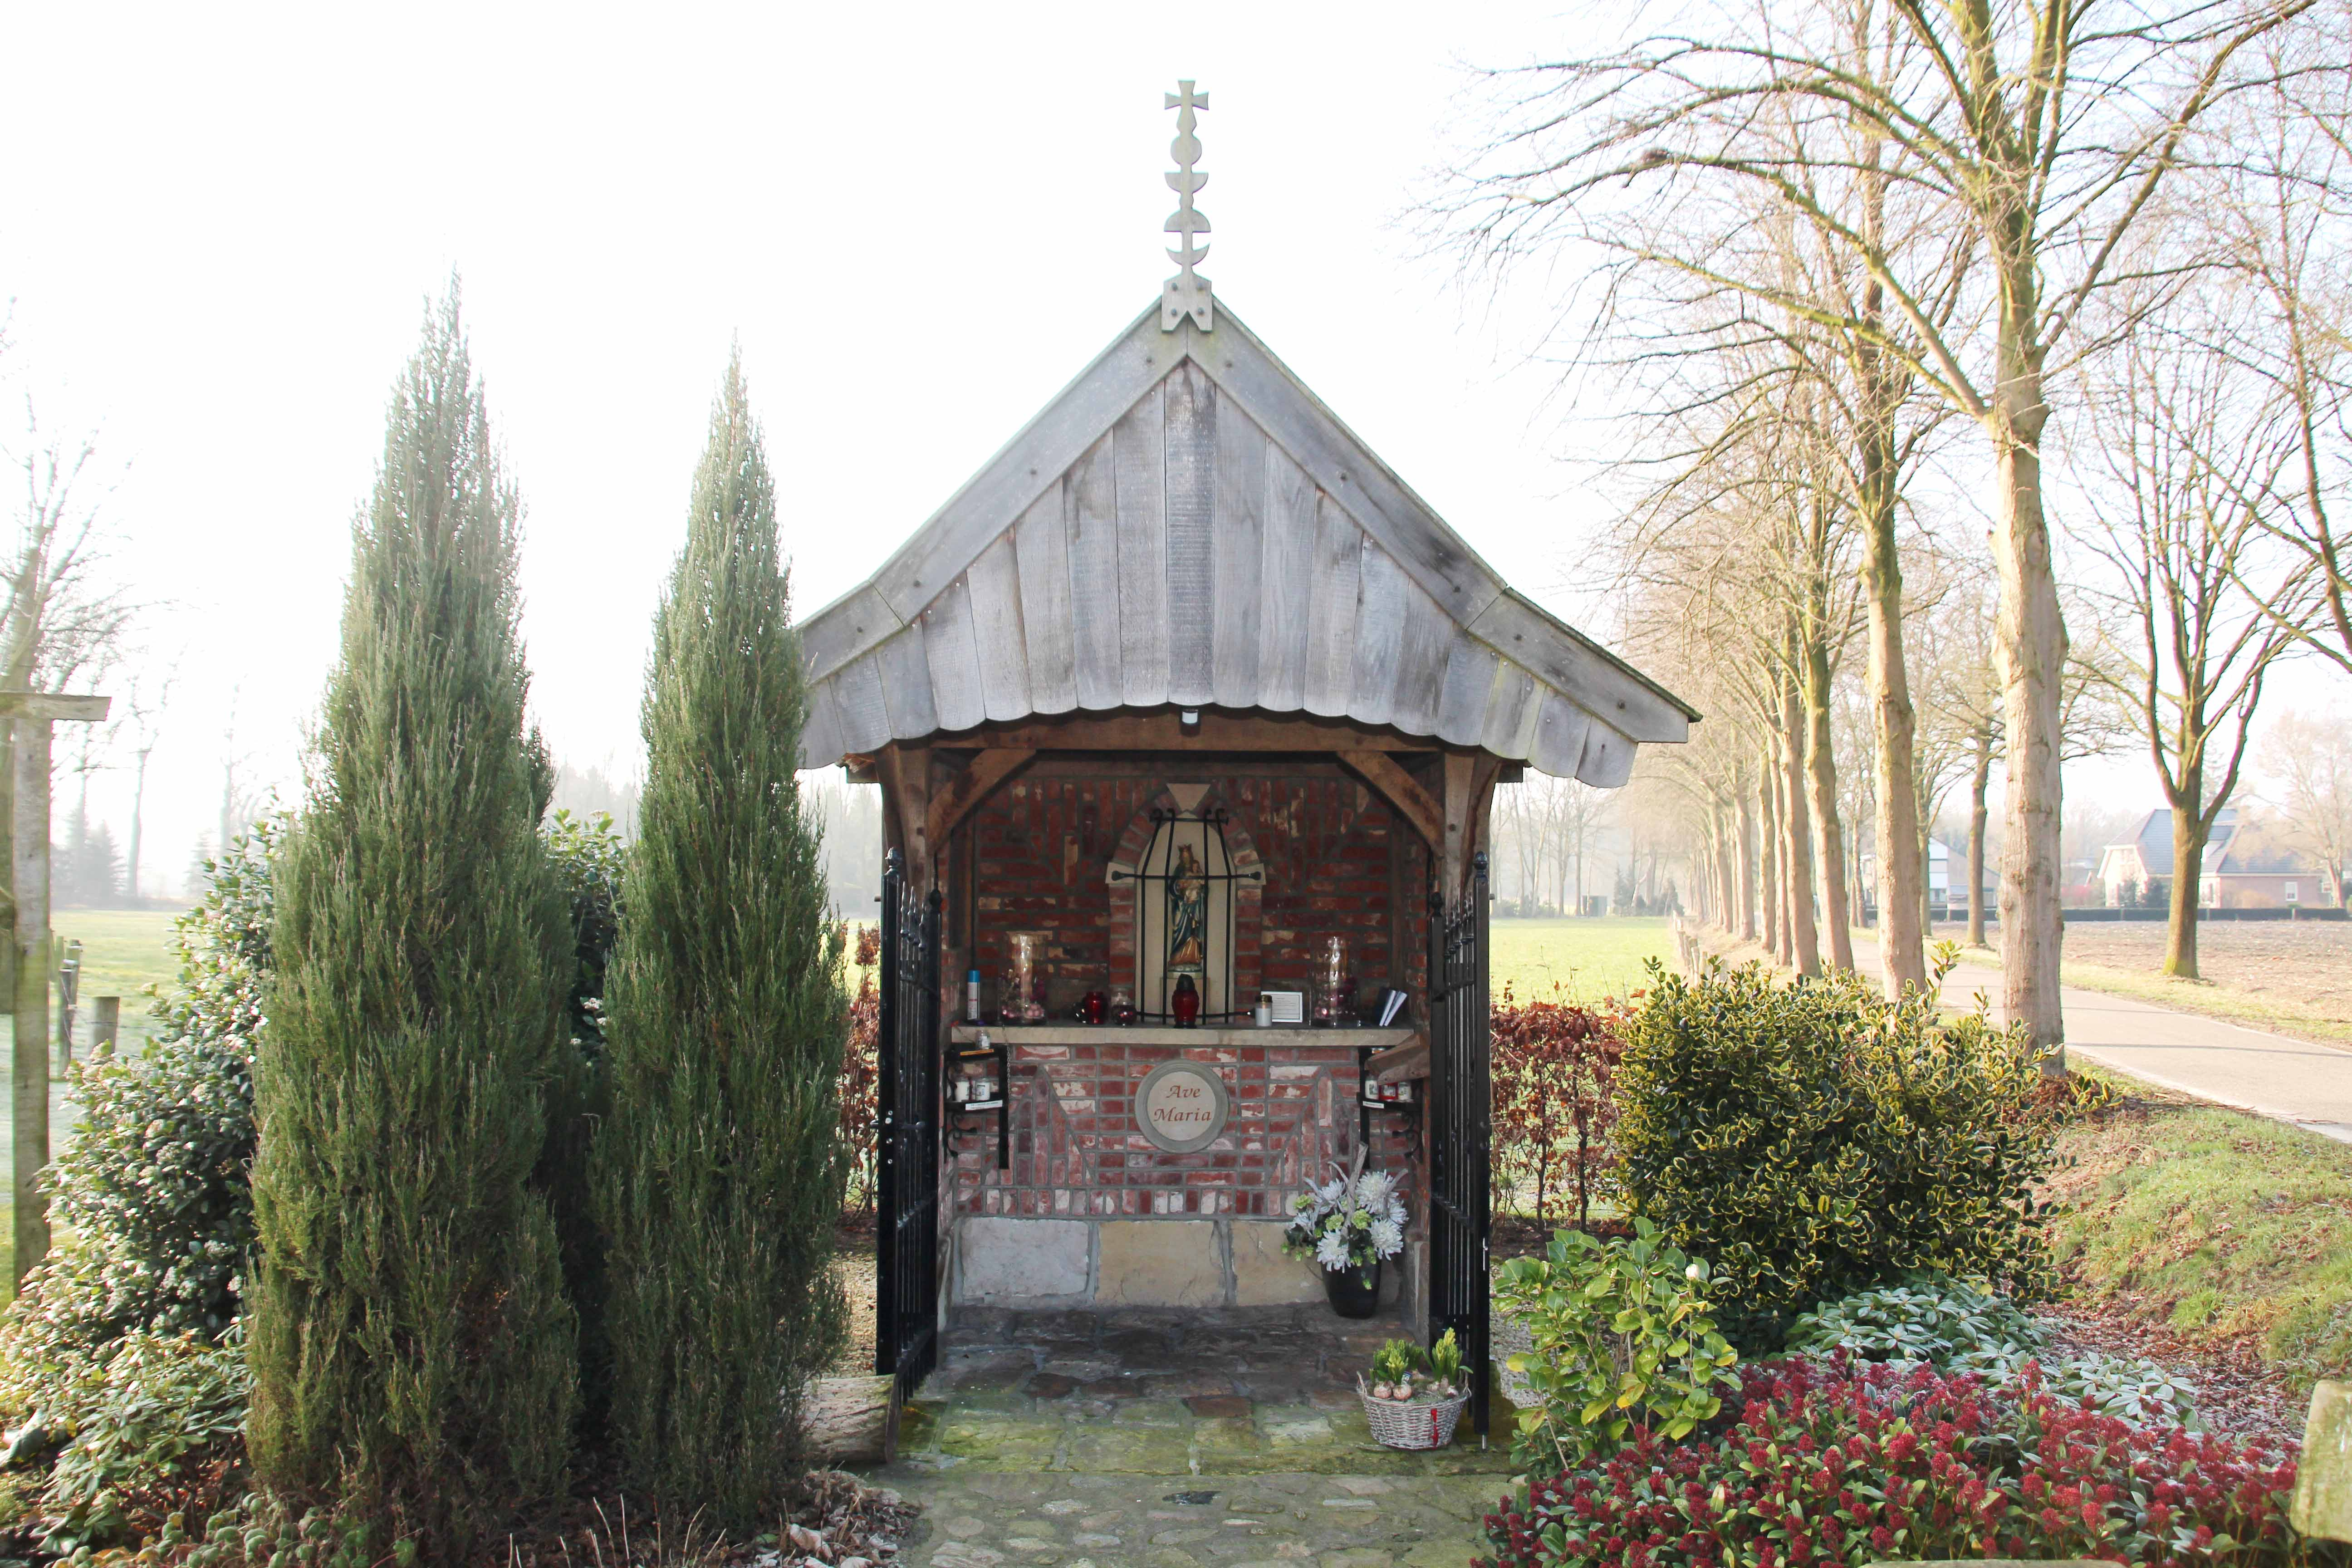 106. Mariakapel De Geurmei Overdinkel